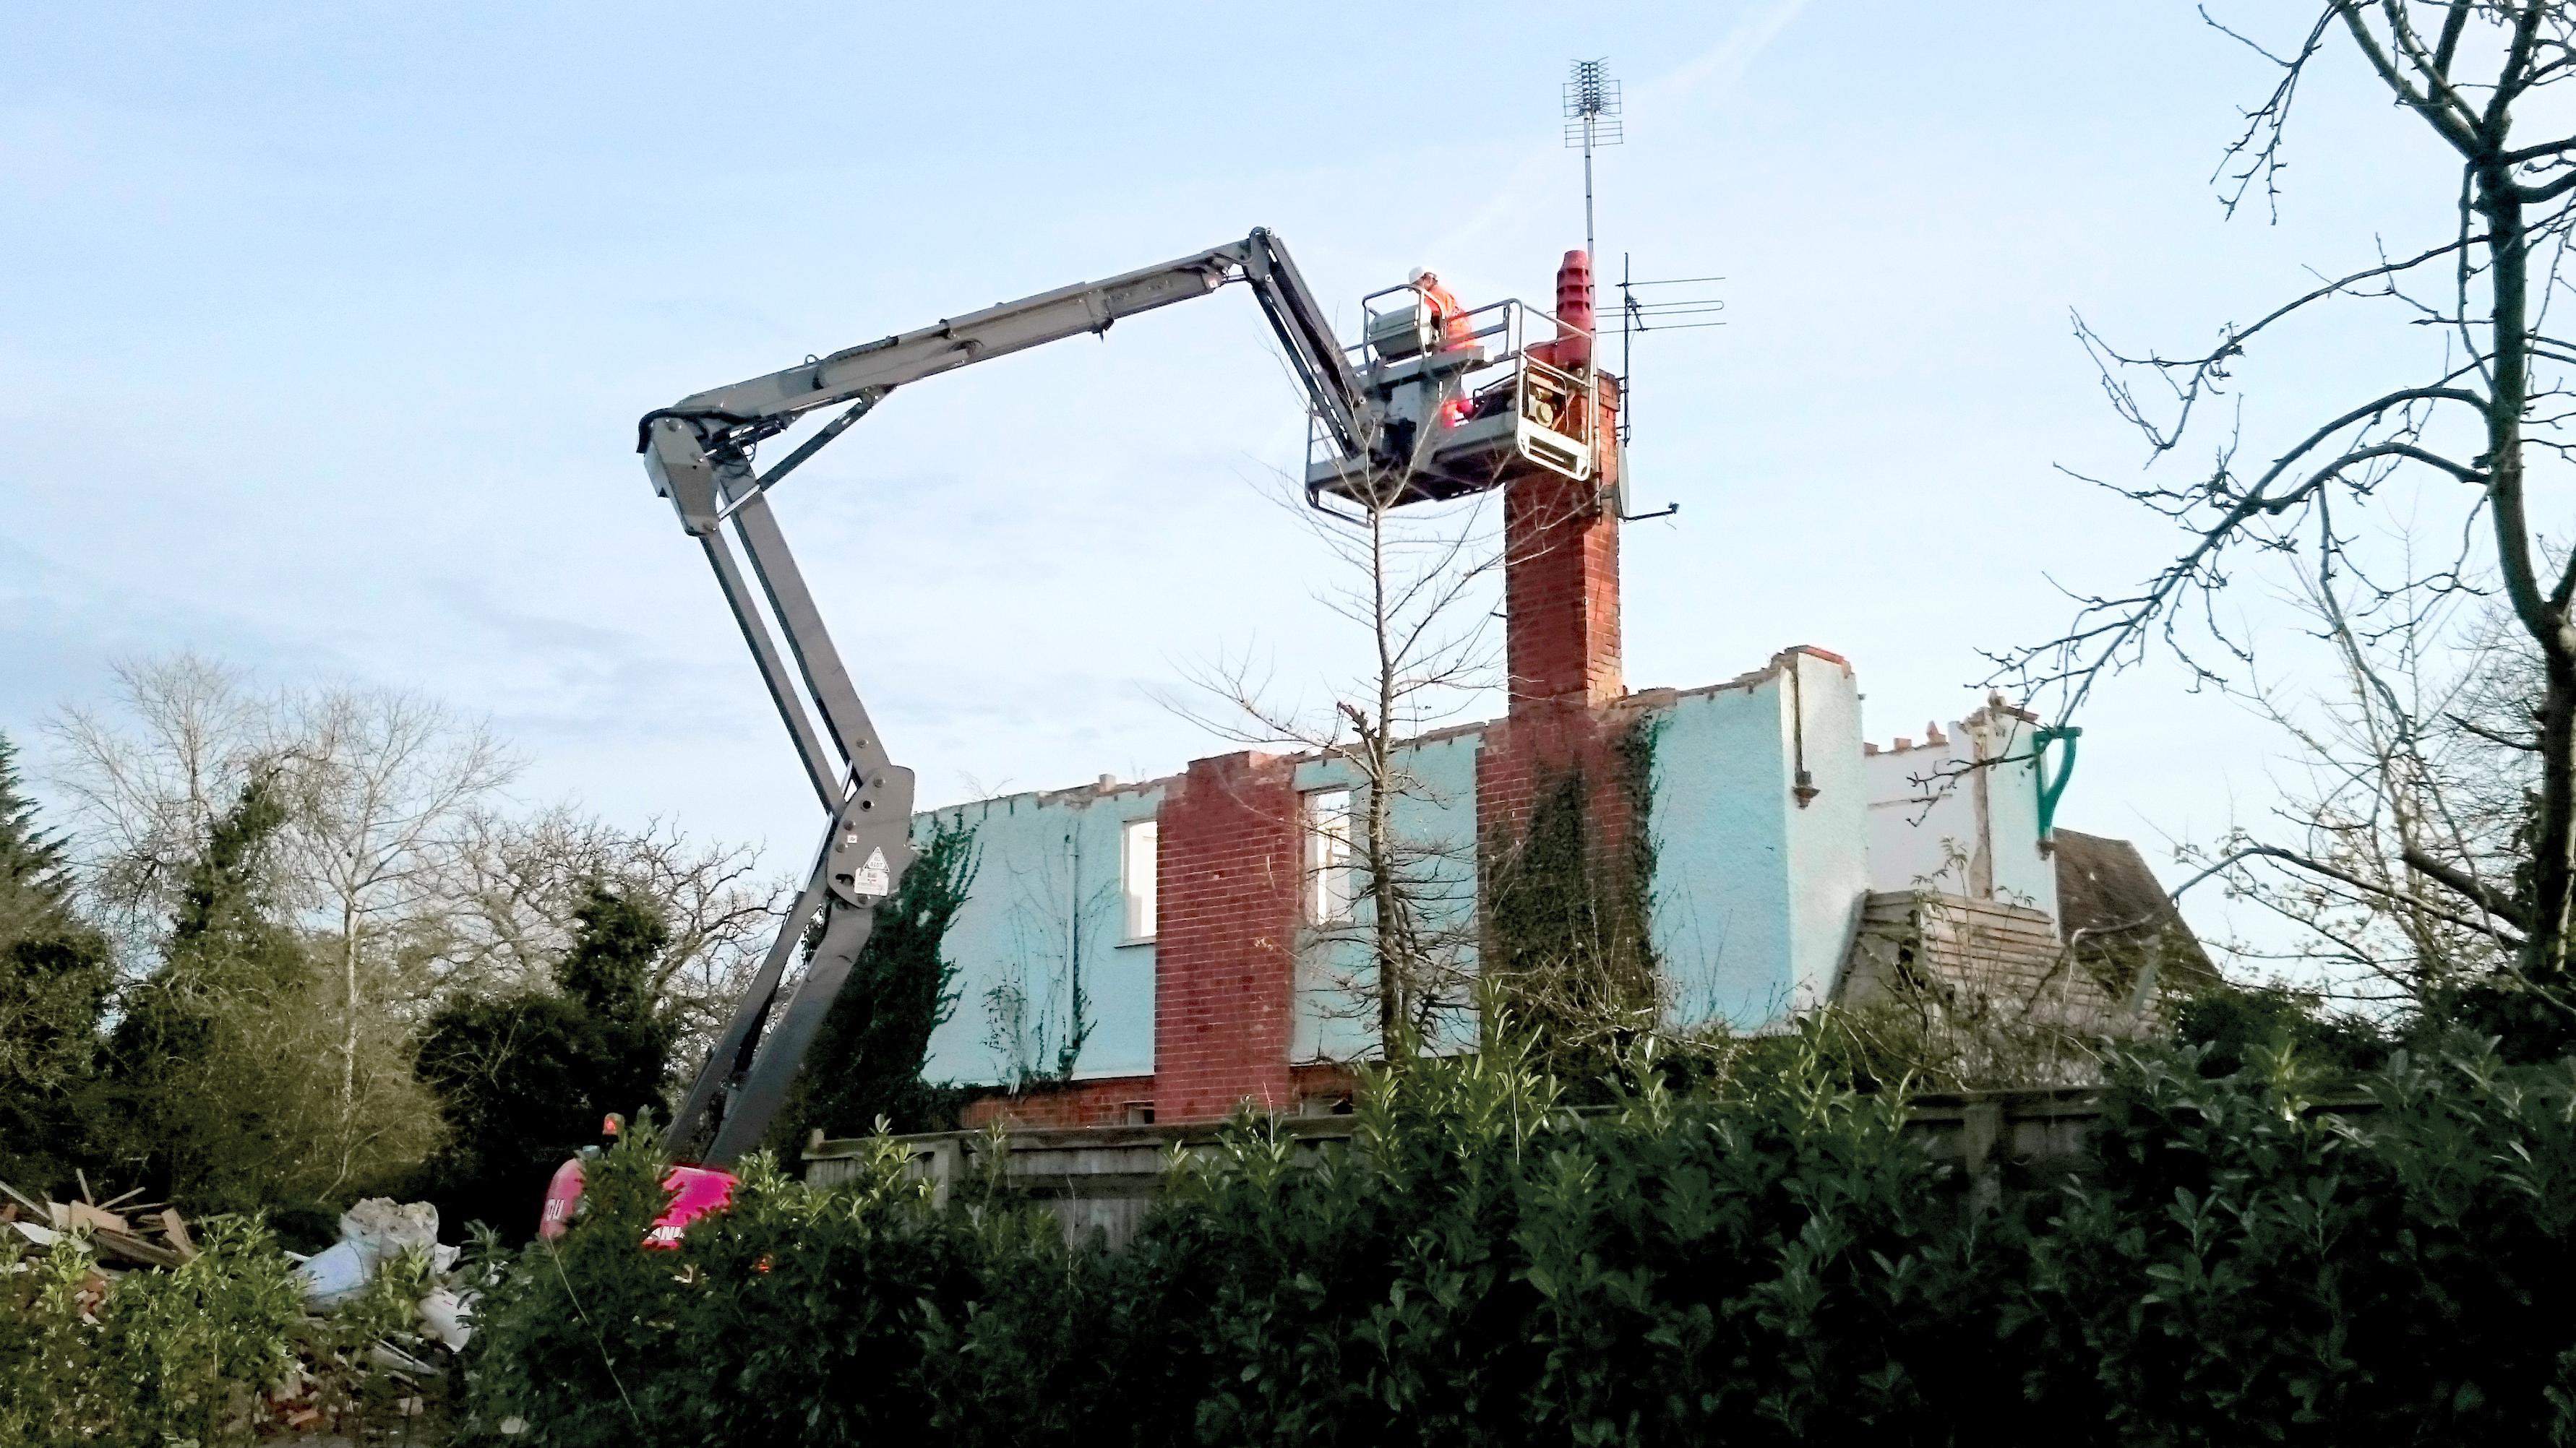 Project 3 - House Demolition image 8